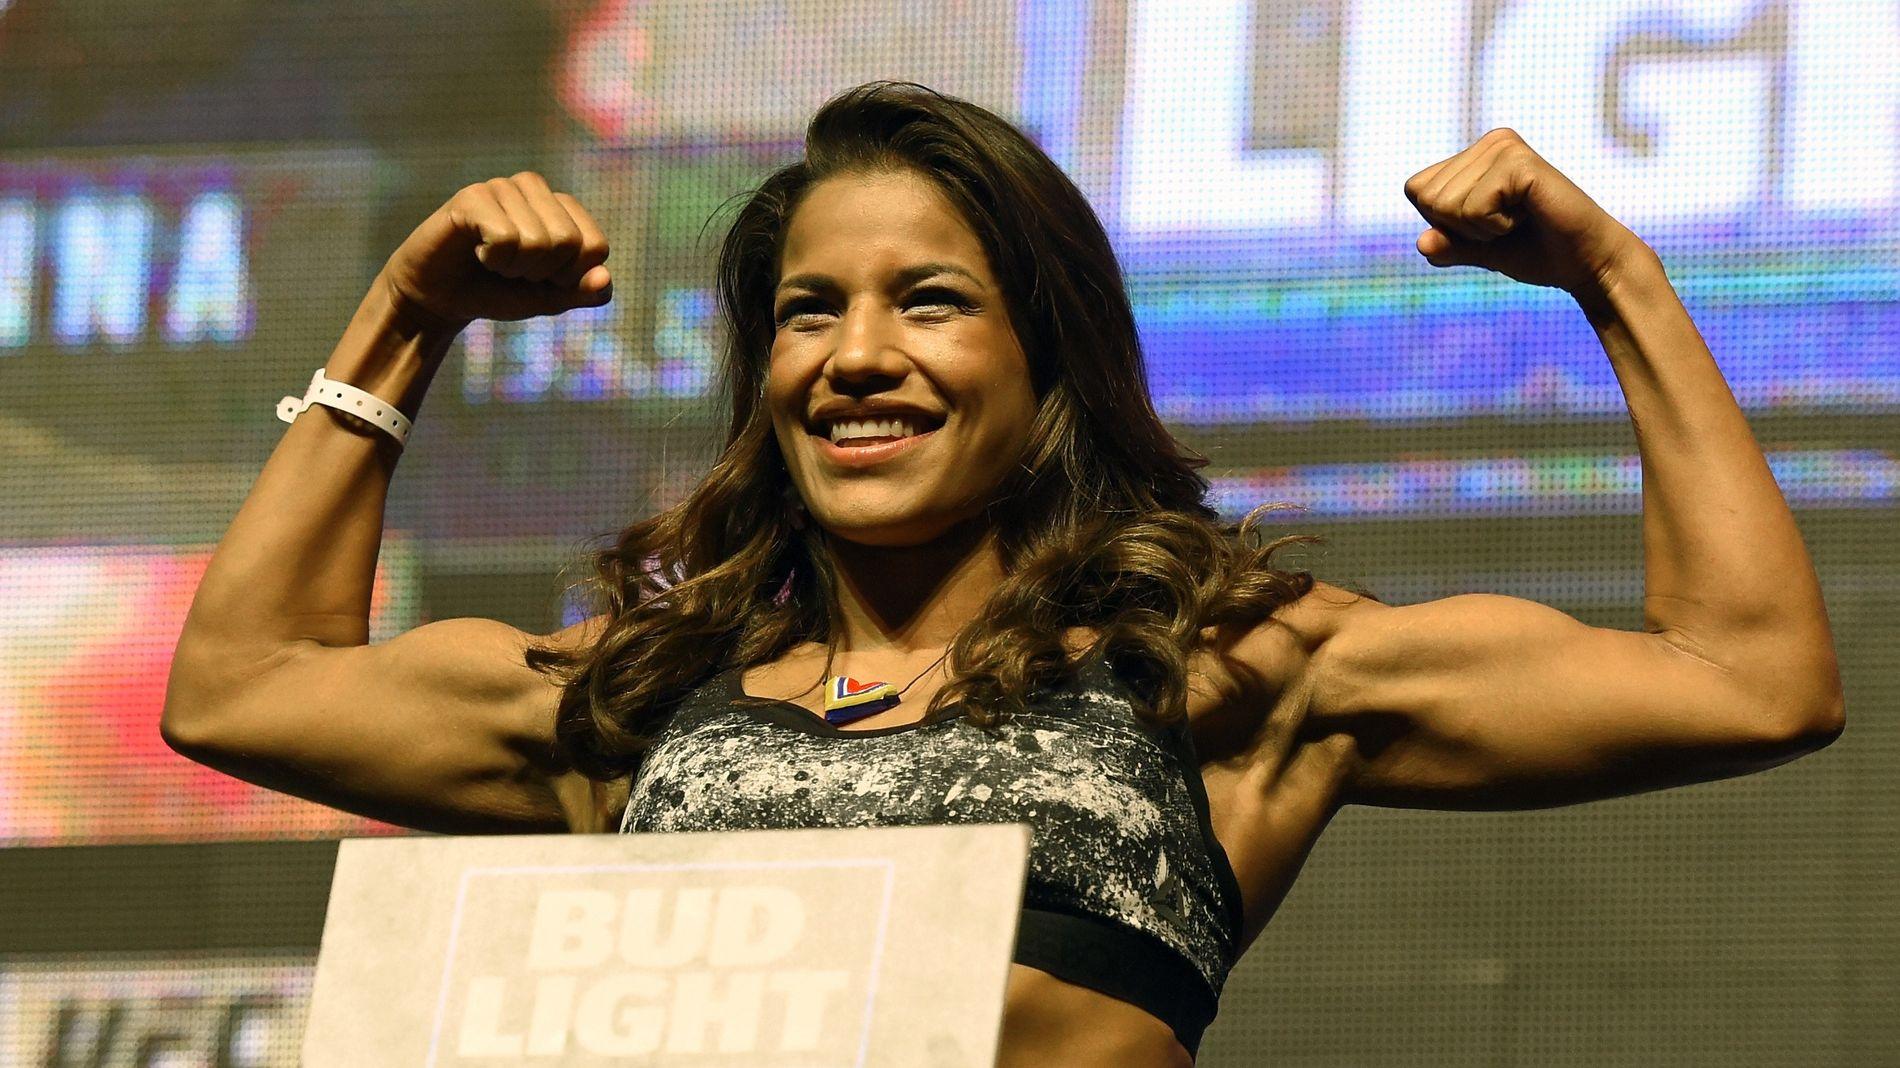 GÅR KAMP I NATT: Julianna Pena poserer på vekta i Las Vegas i juli i fjor. I natt skal hun gå kamp i Denver.